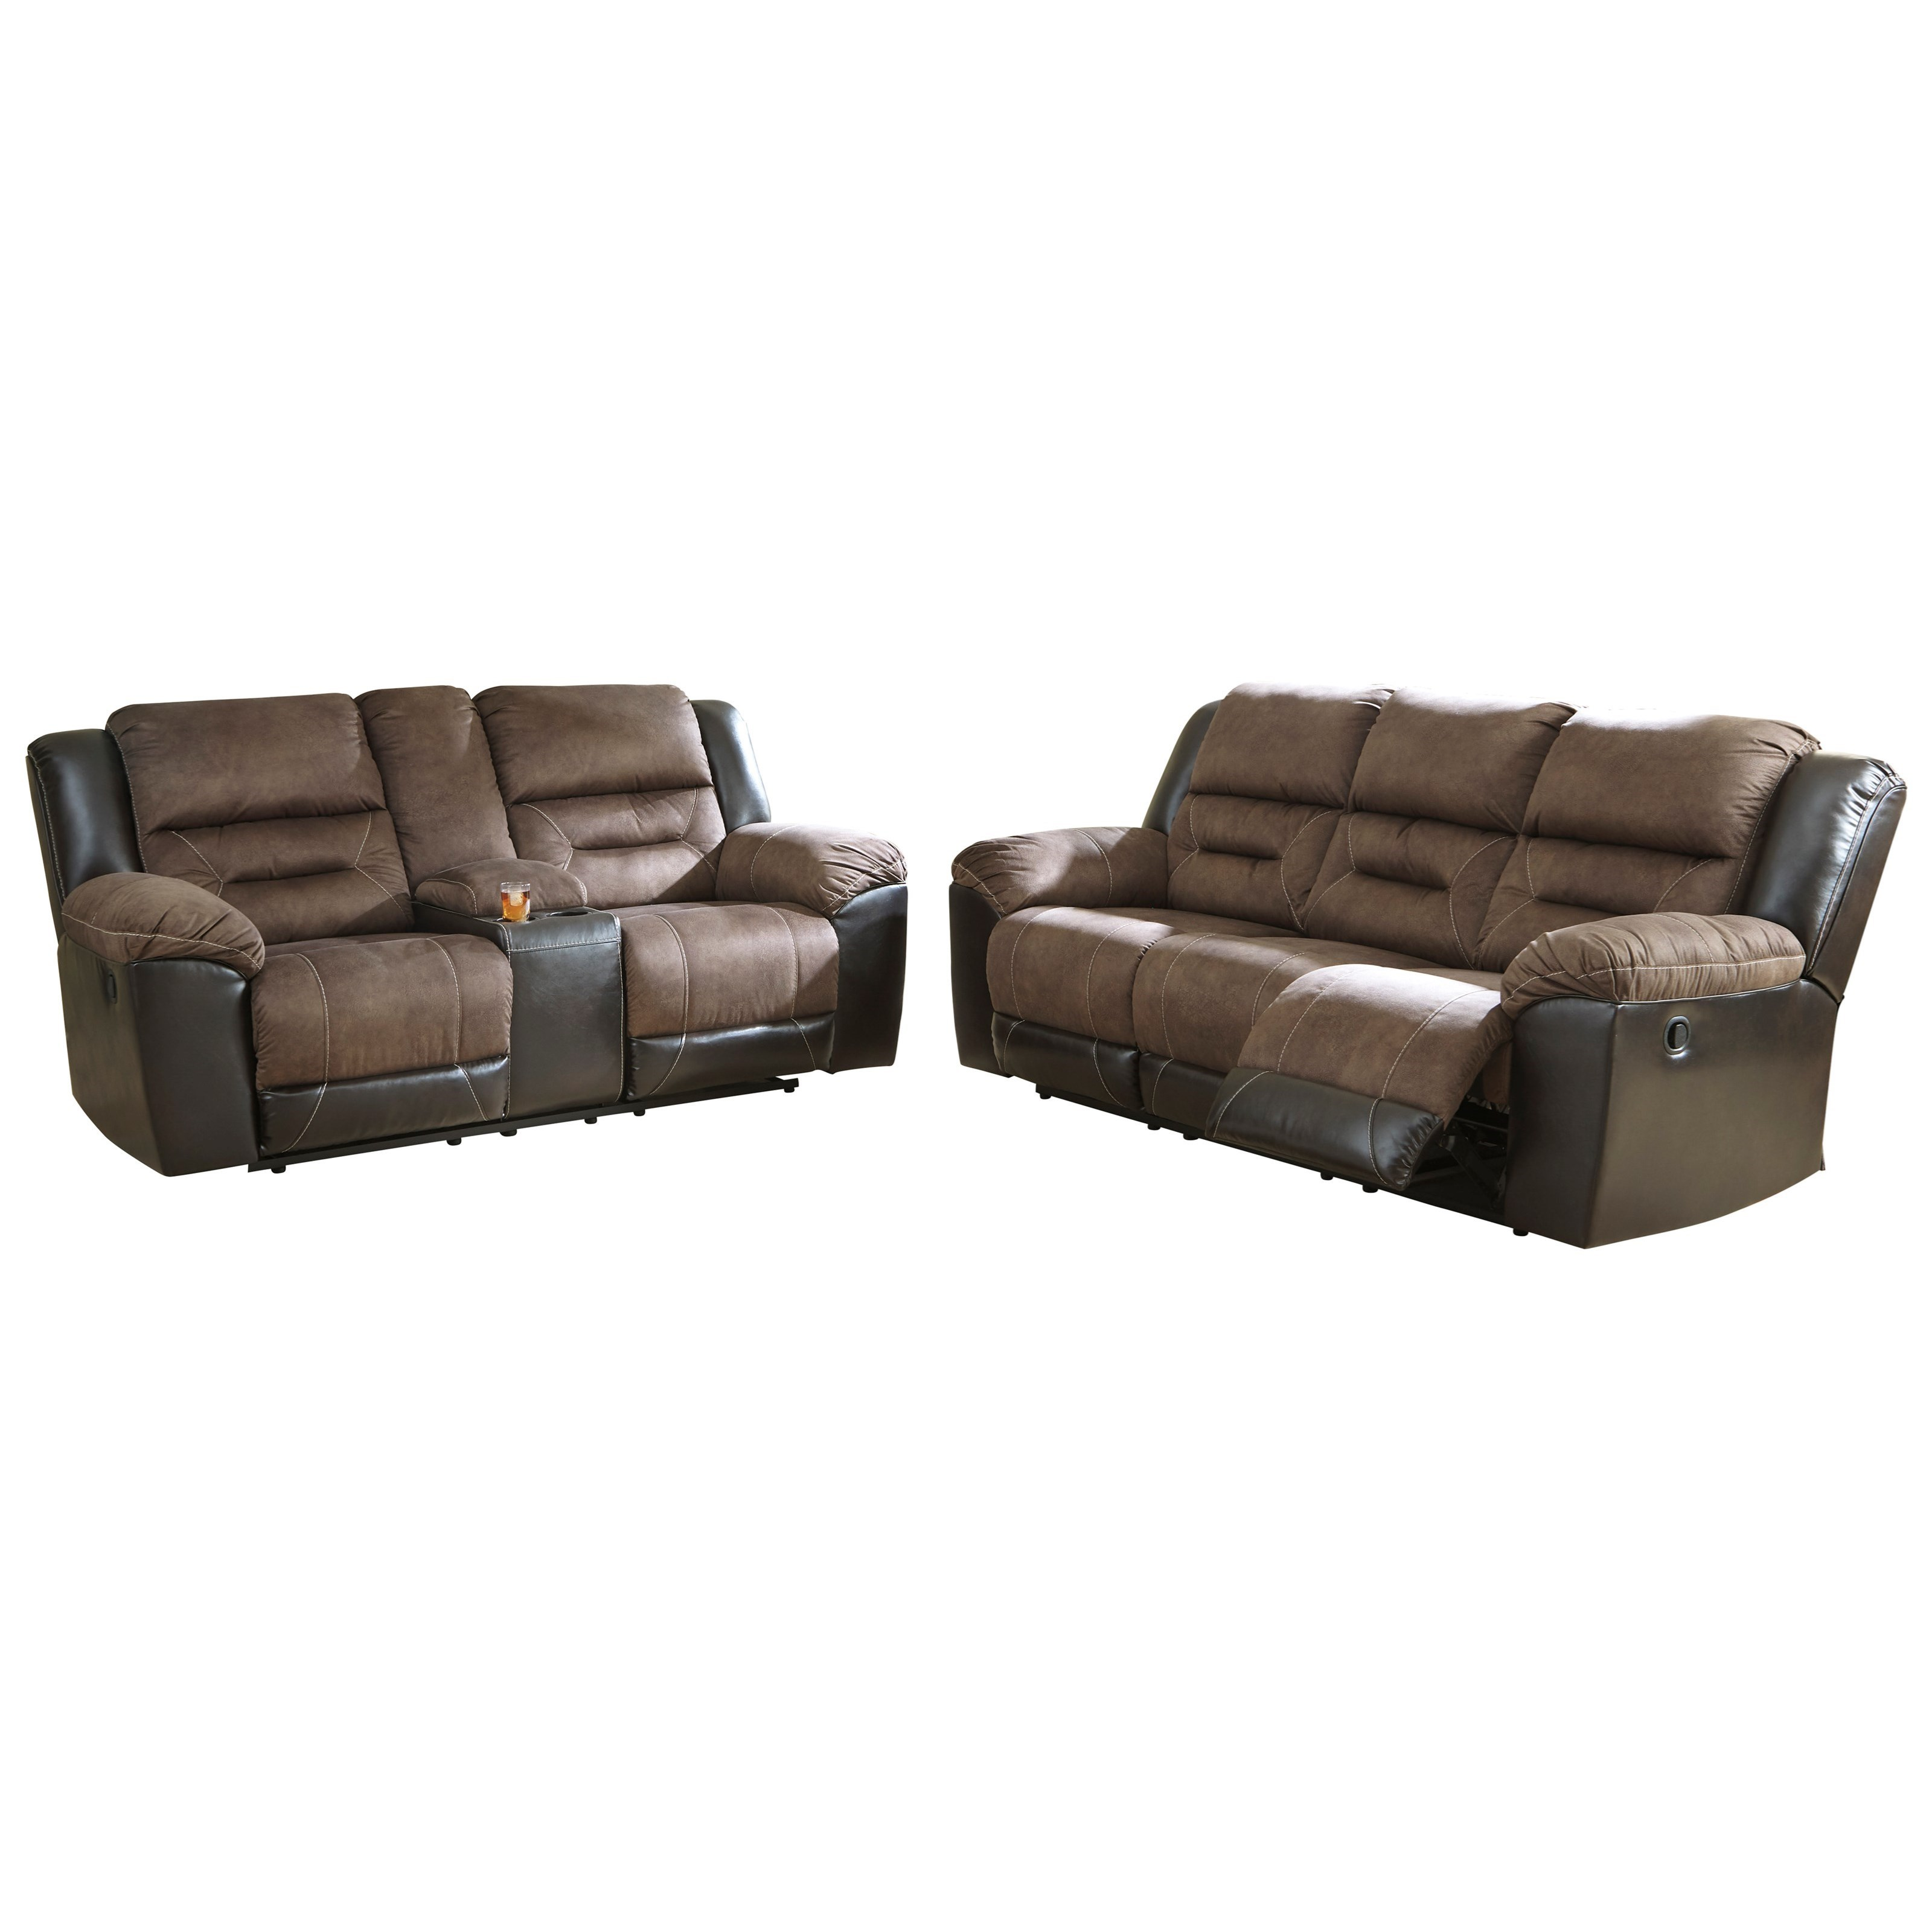 Ashley Furniture Kenosha: Signature Design By Ashley Earhart 2910188 Casual